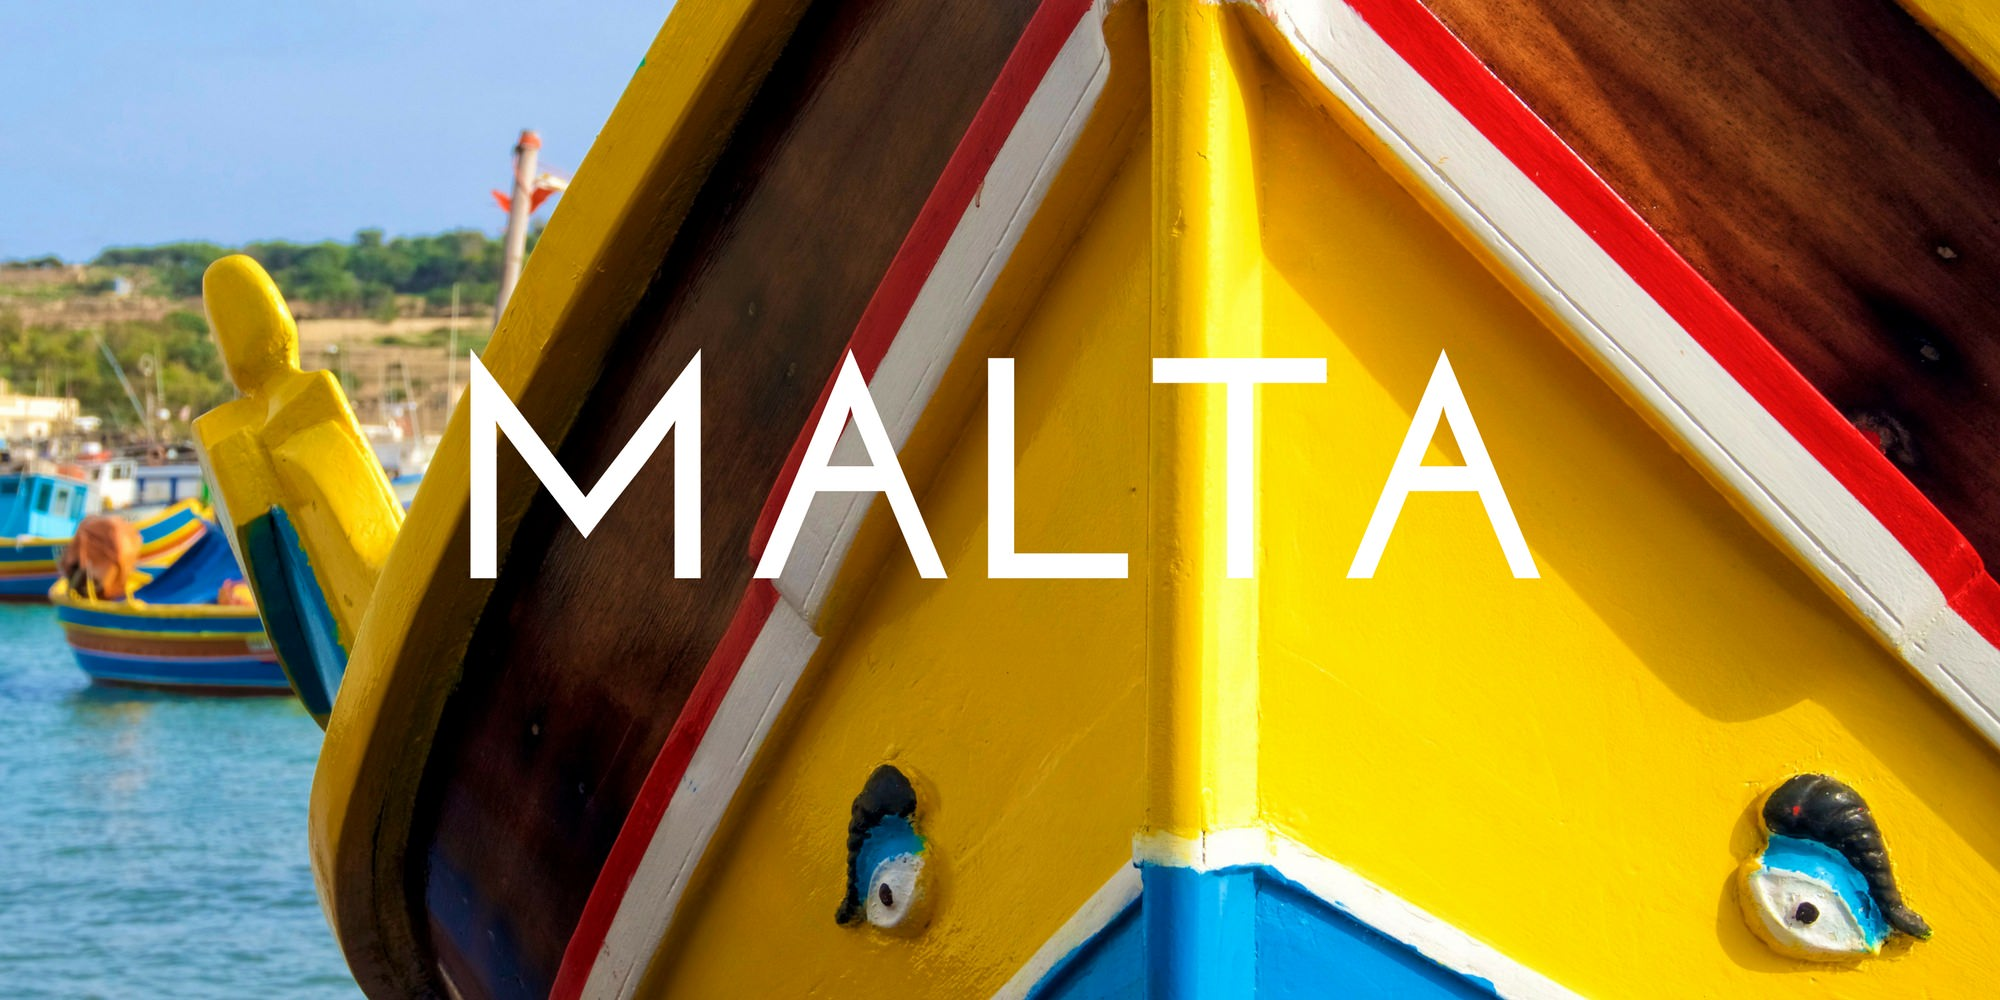 Malta - Authentic Traveling - Header